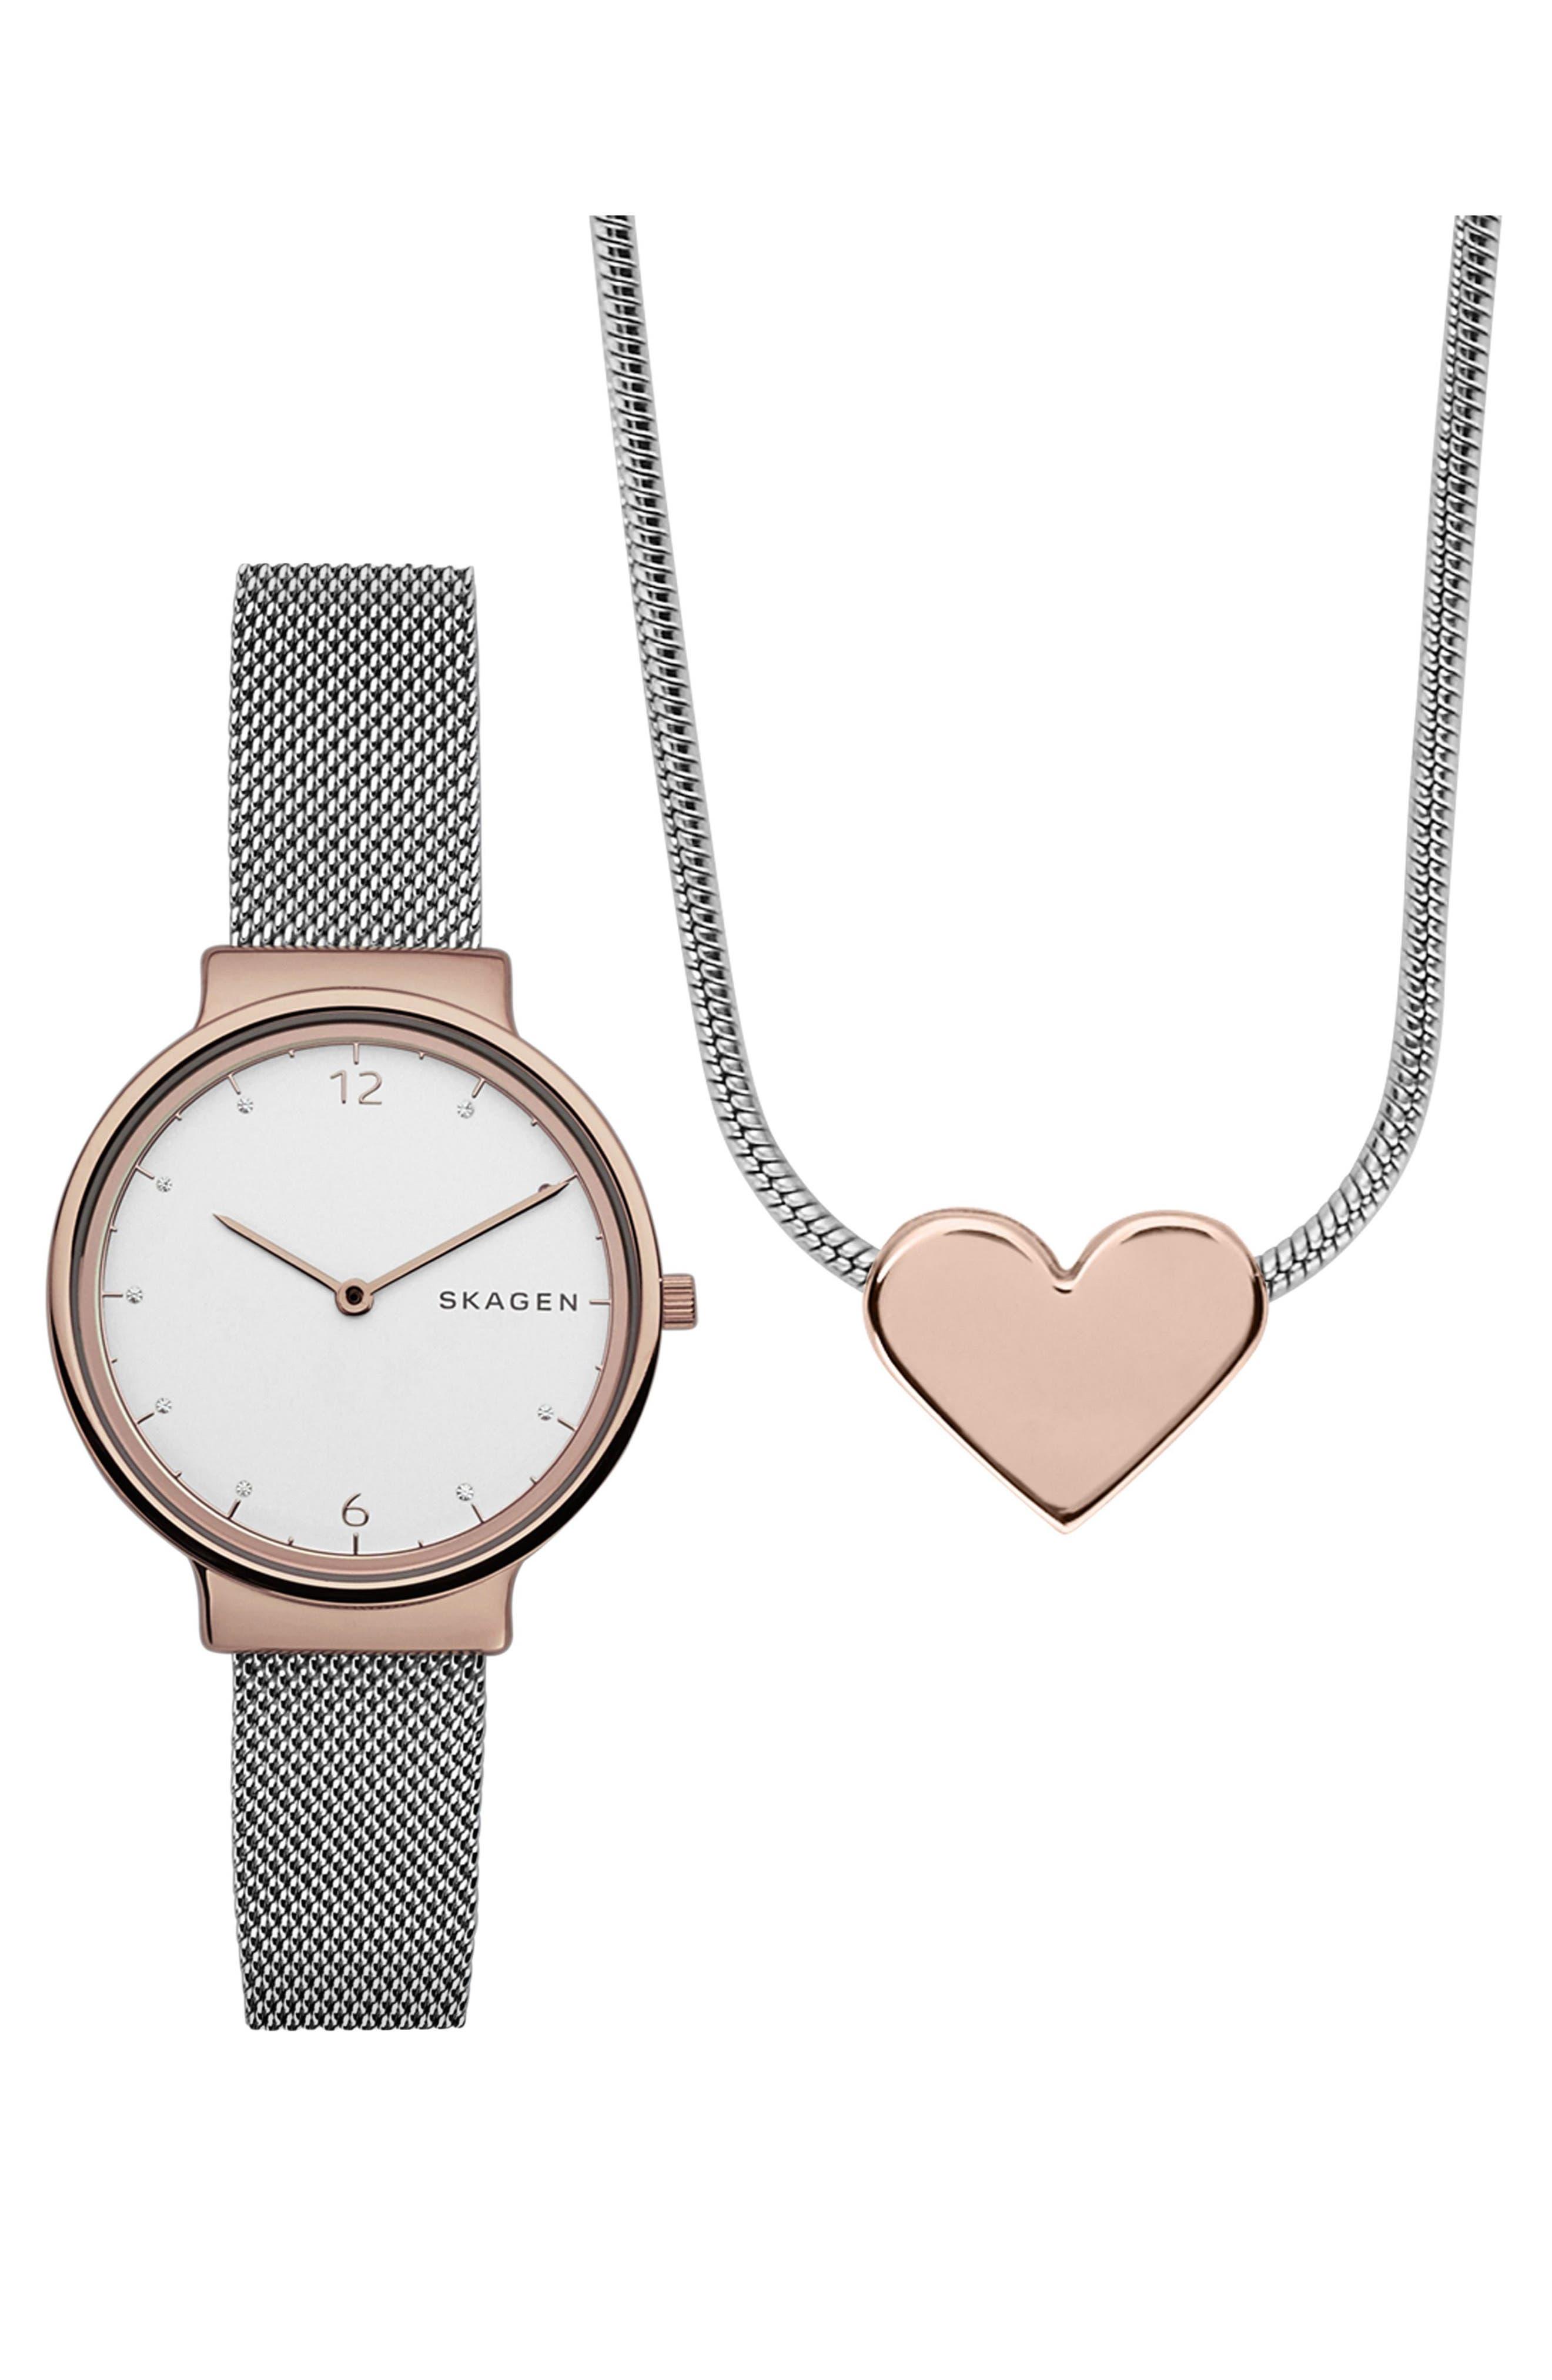 Skagen Ancher Leather Strap Watch & Necklace Set, 34mm